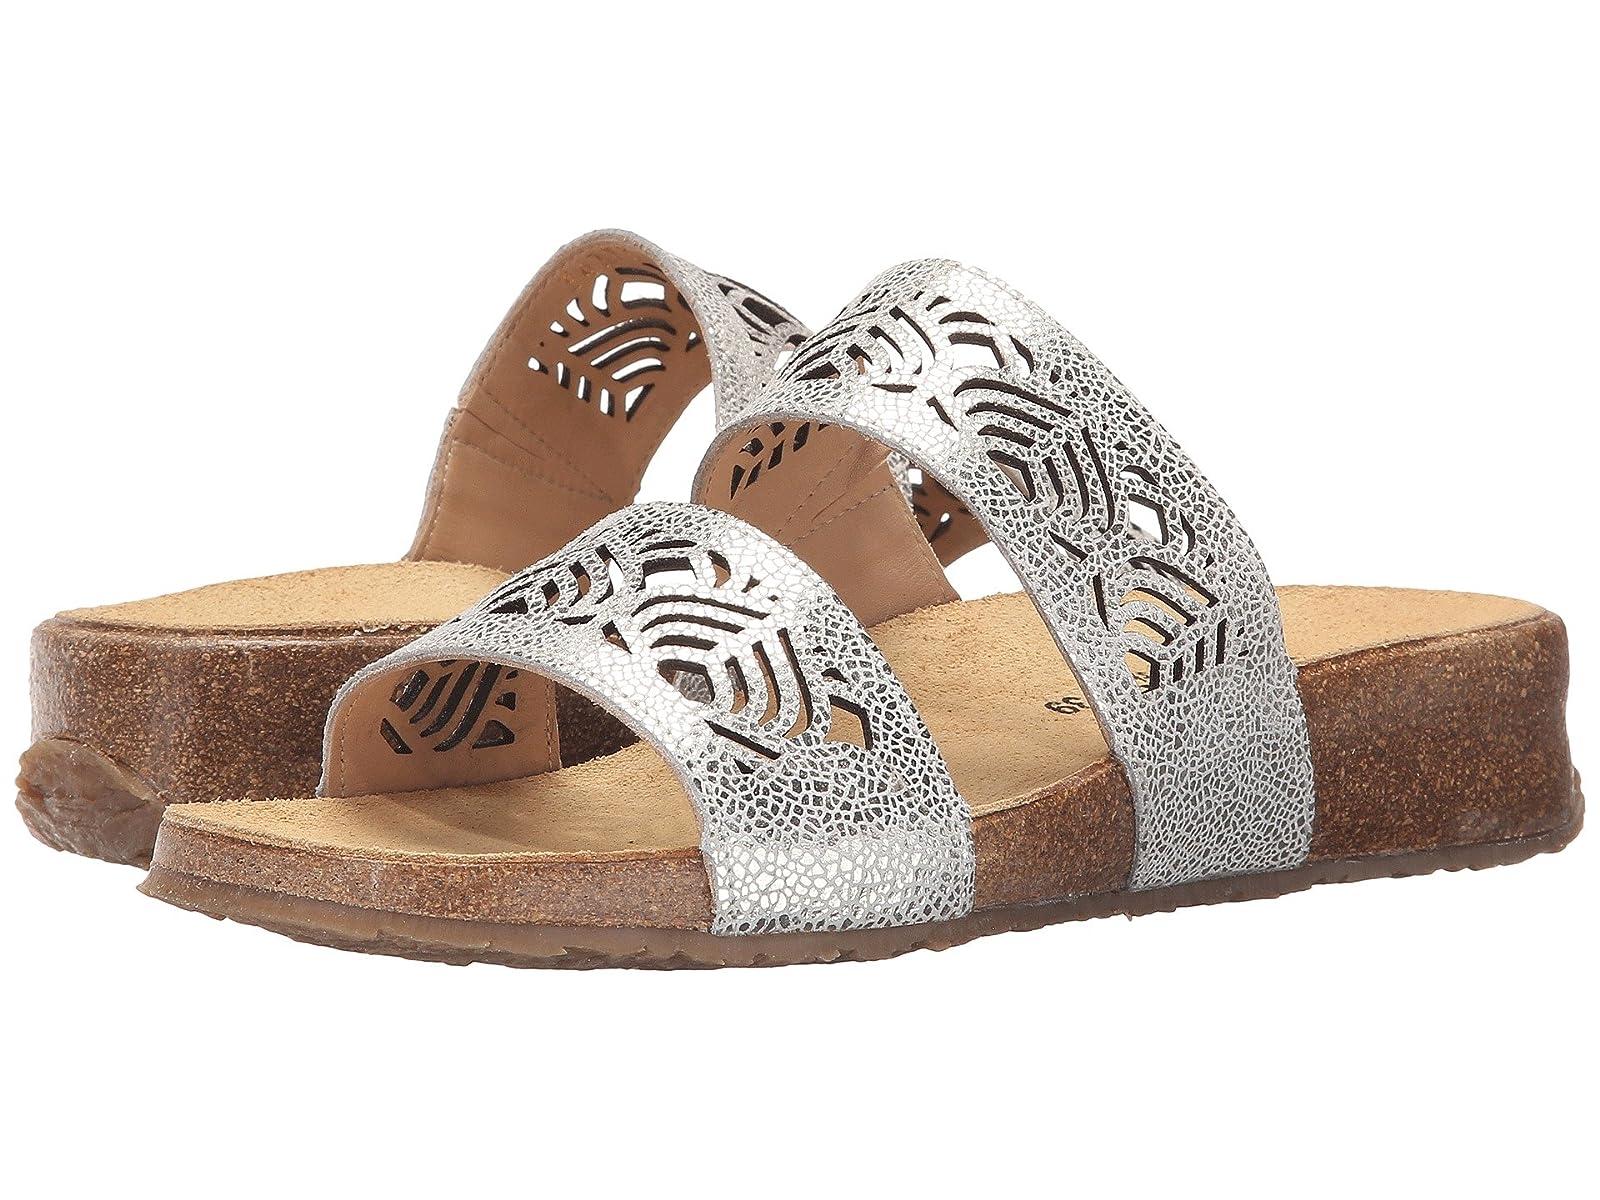 Haflinger GraceCheap and distinctive eye-catching shoes